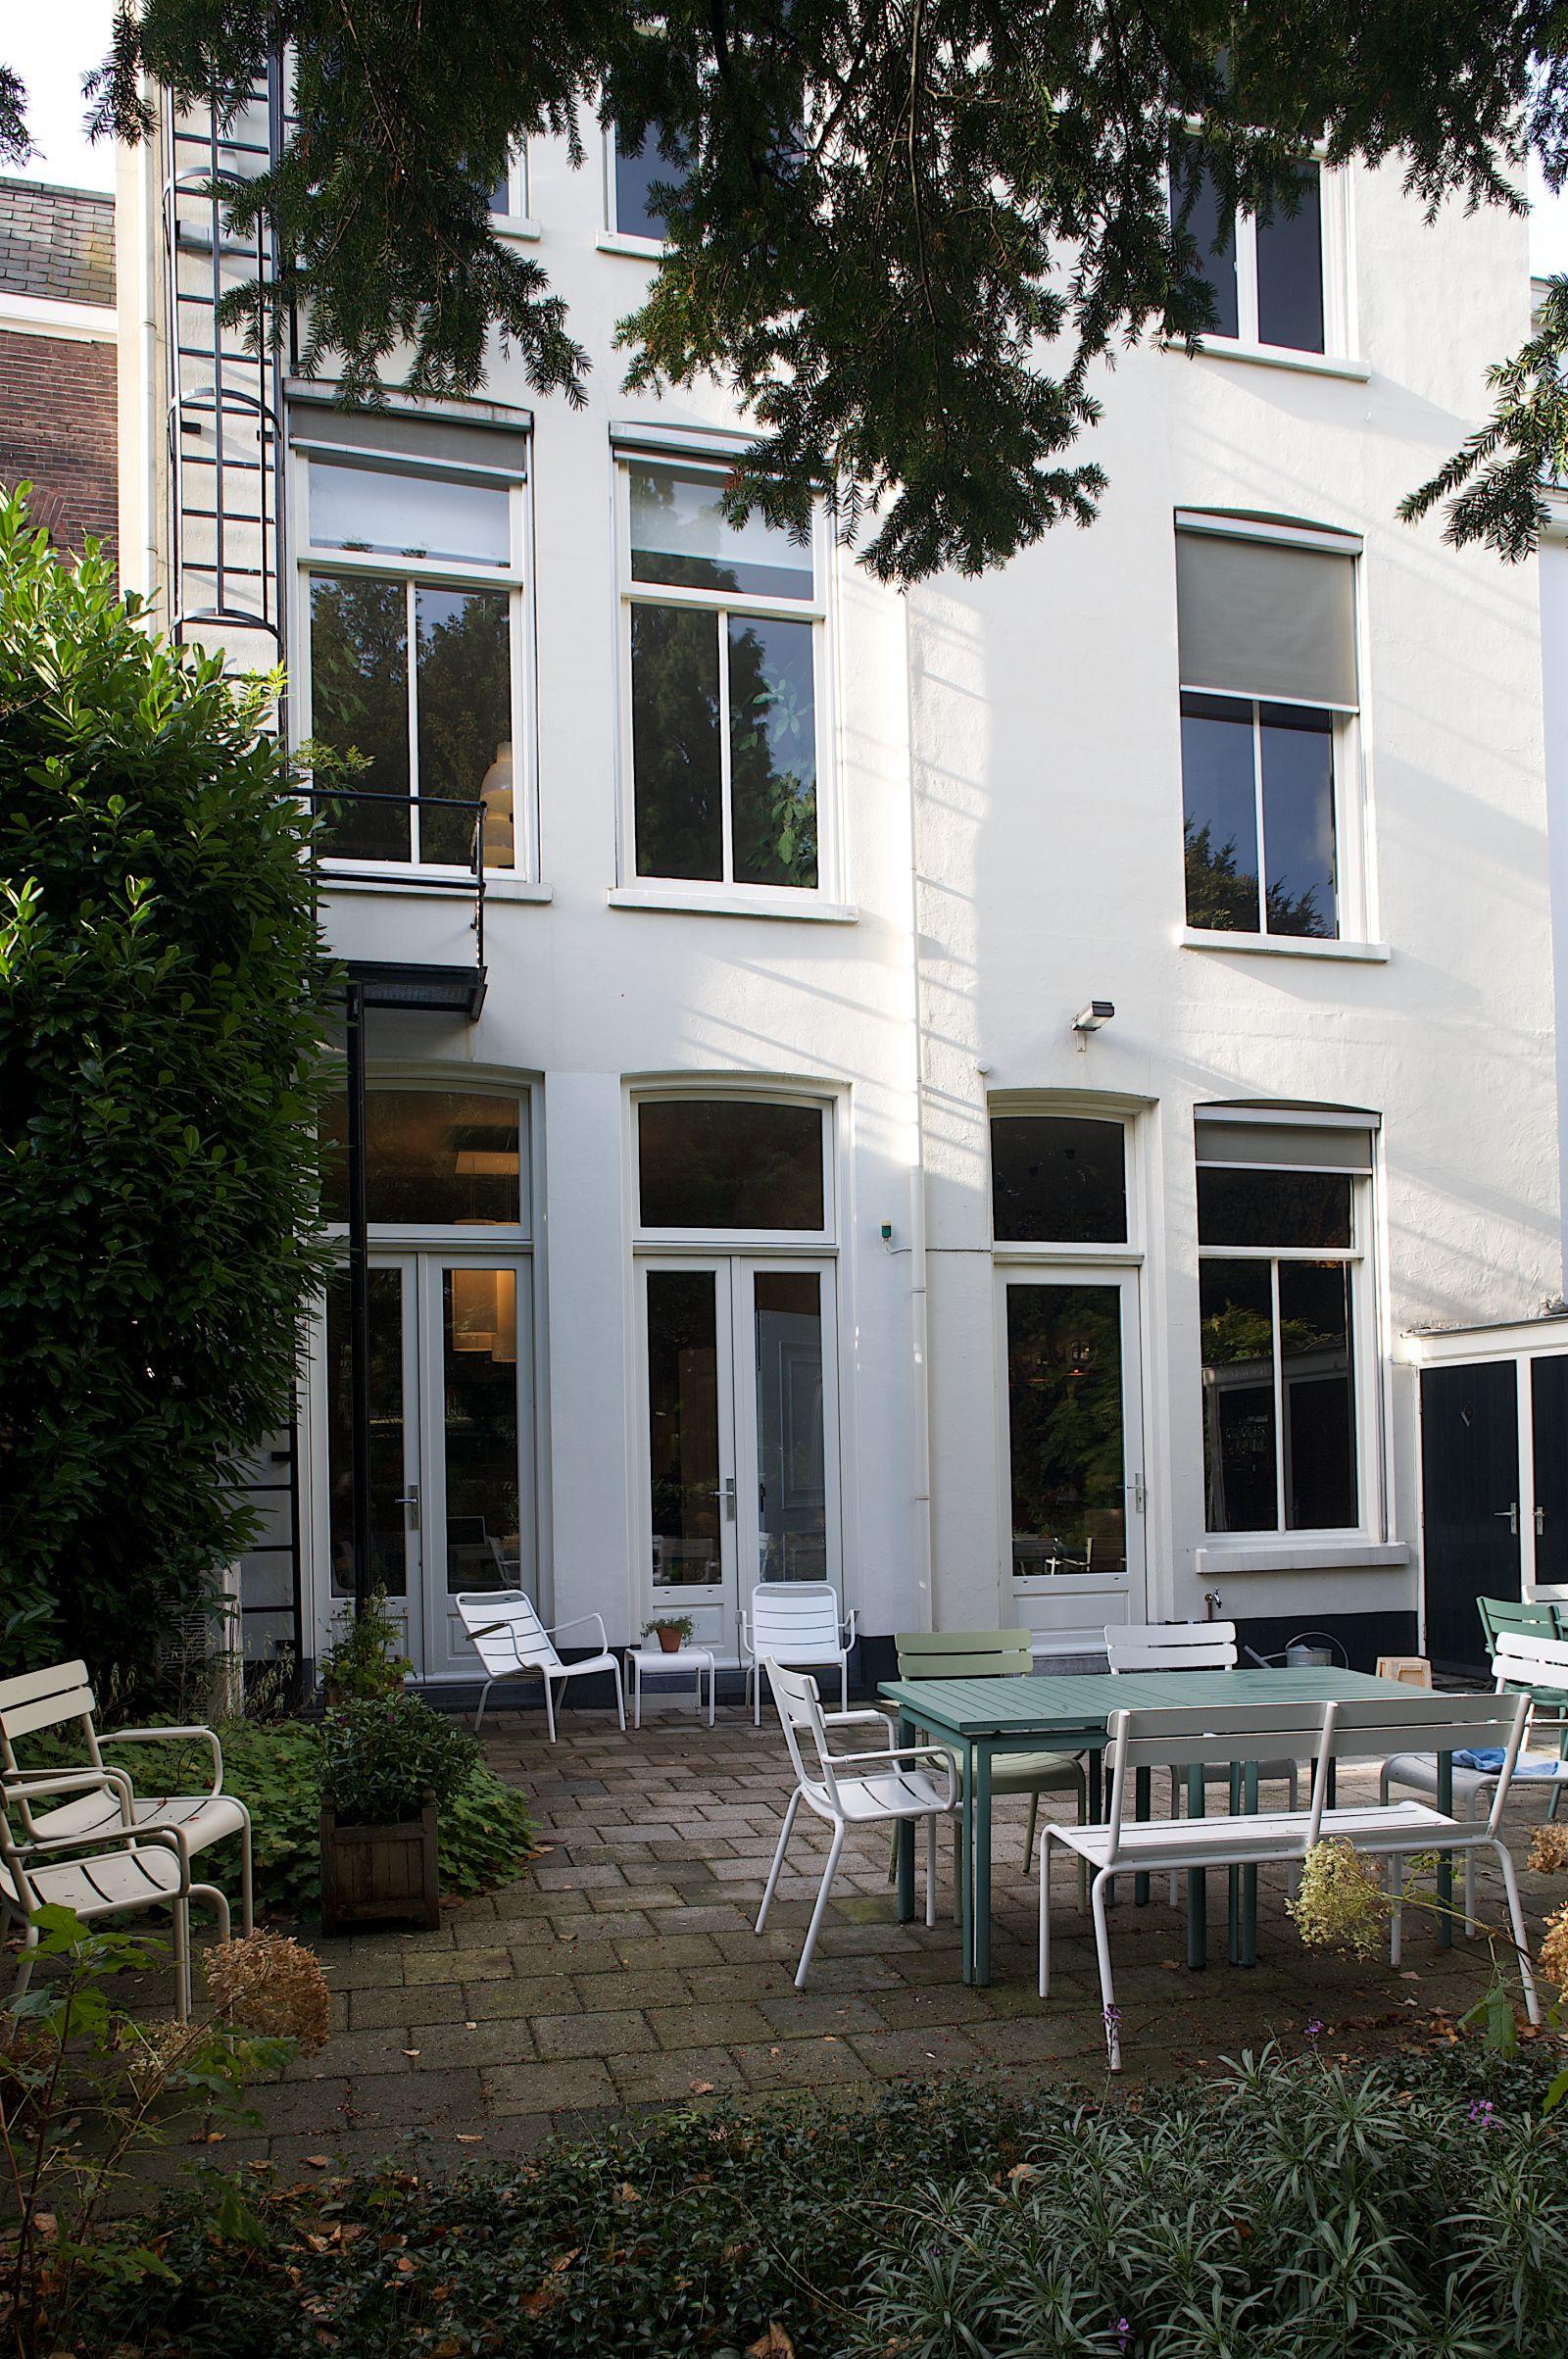 Maliebaan45, Utrecht